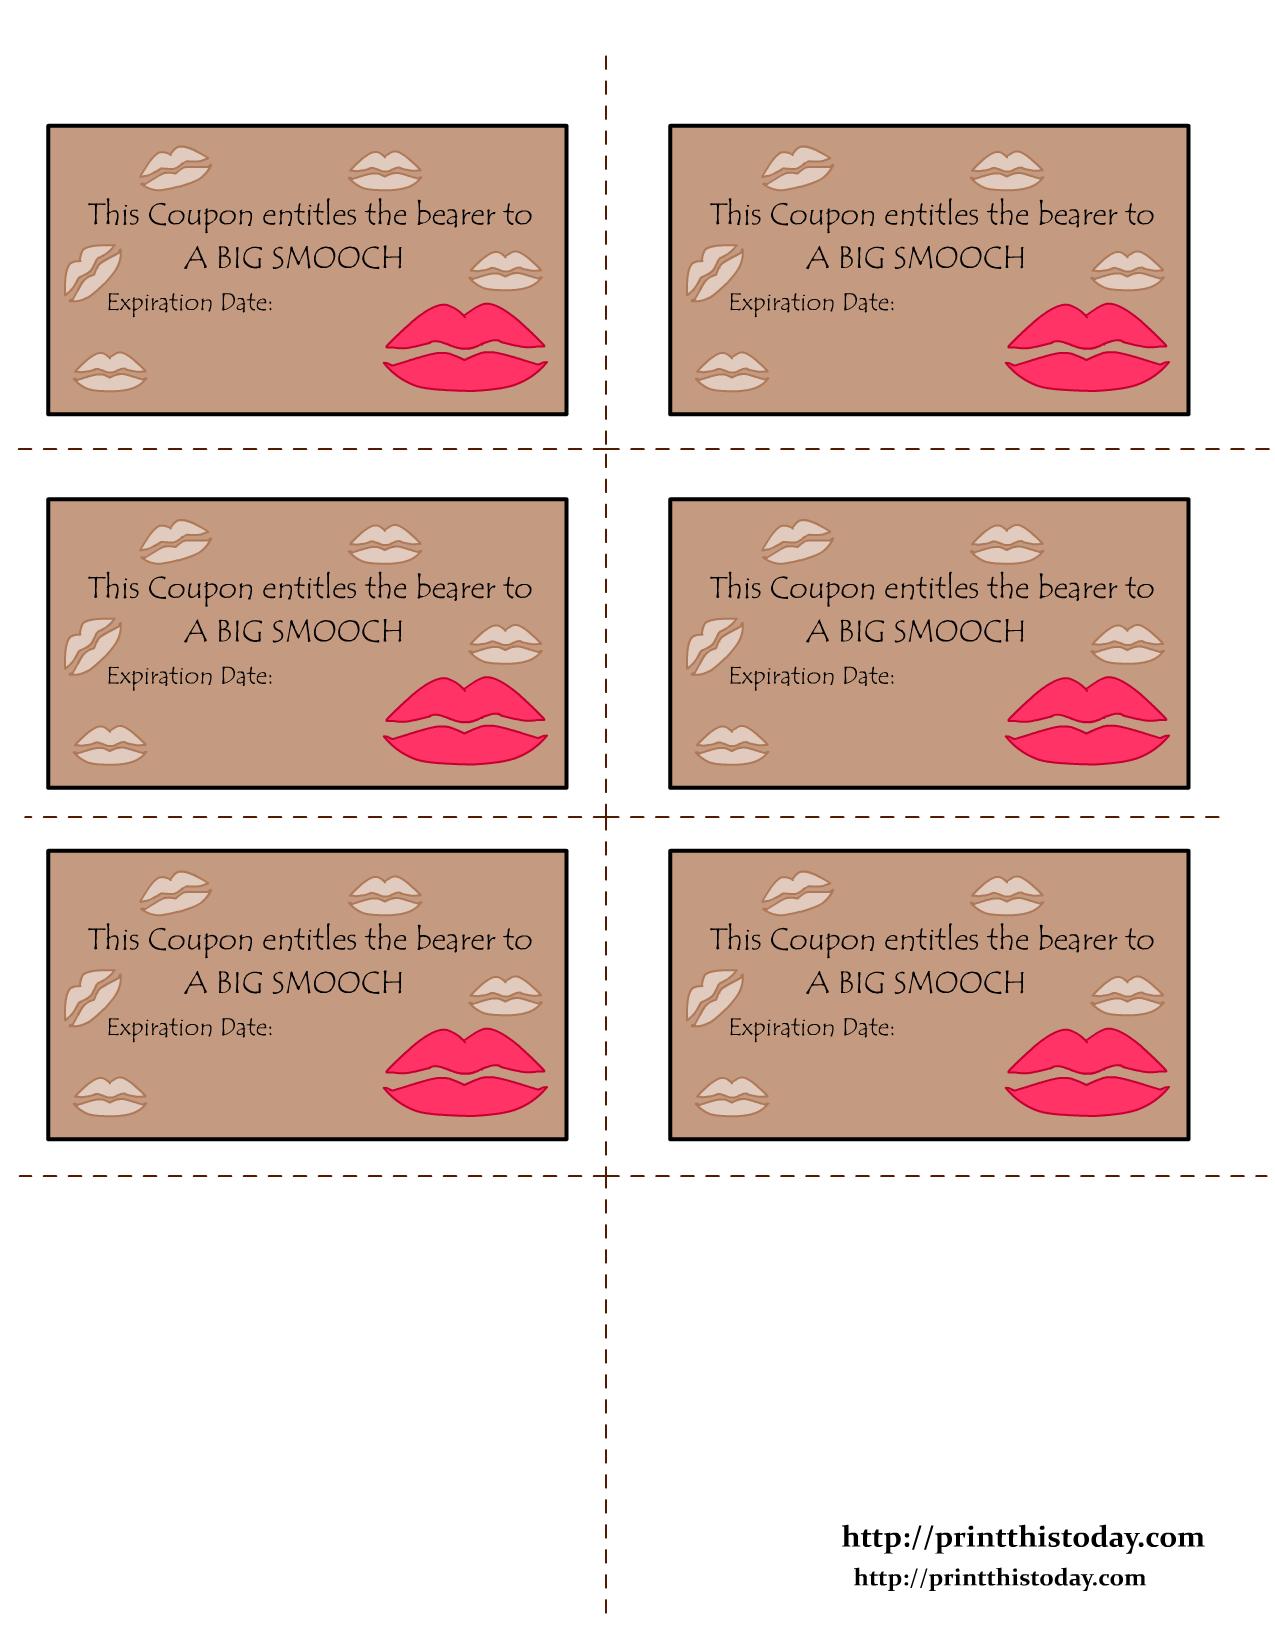 Free Printable Love Coupons - Free Printable Love Coupons